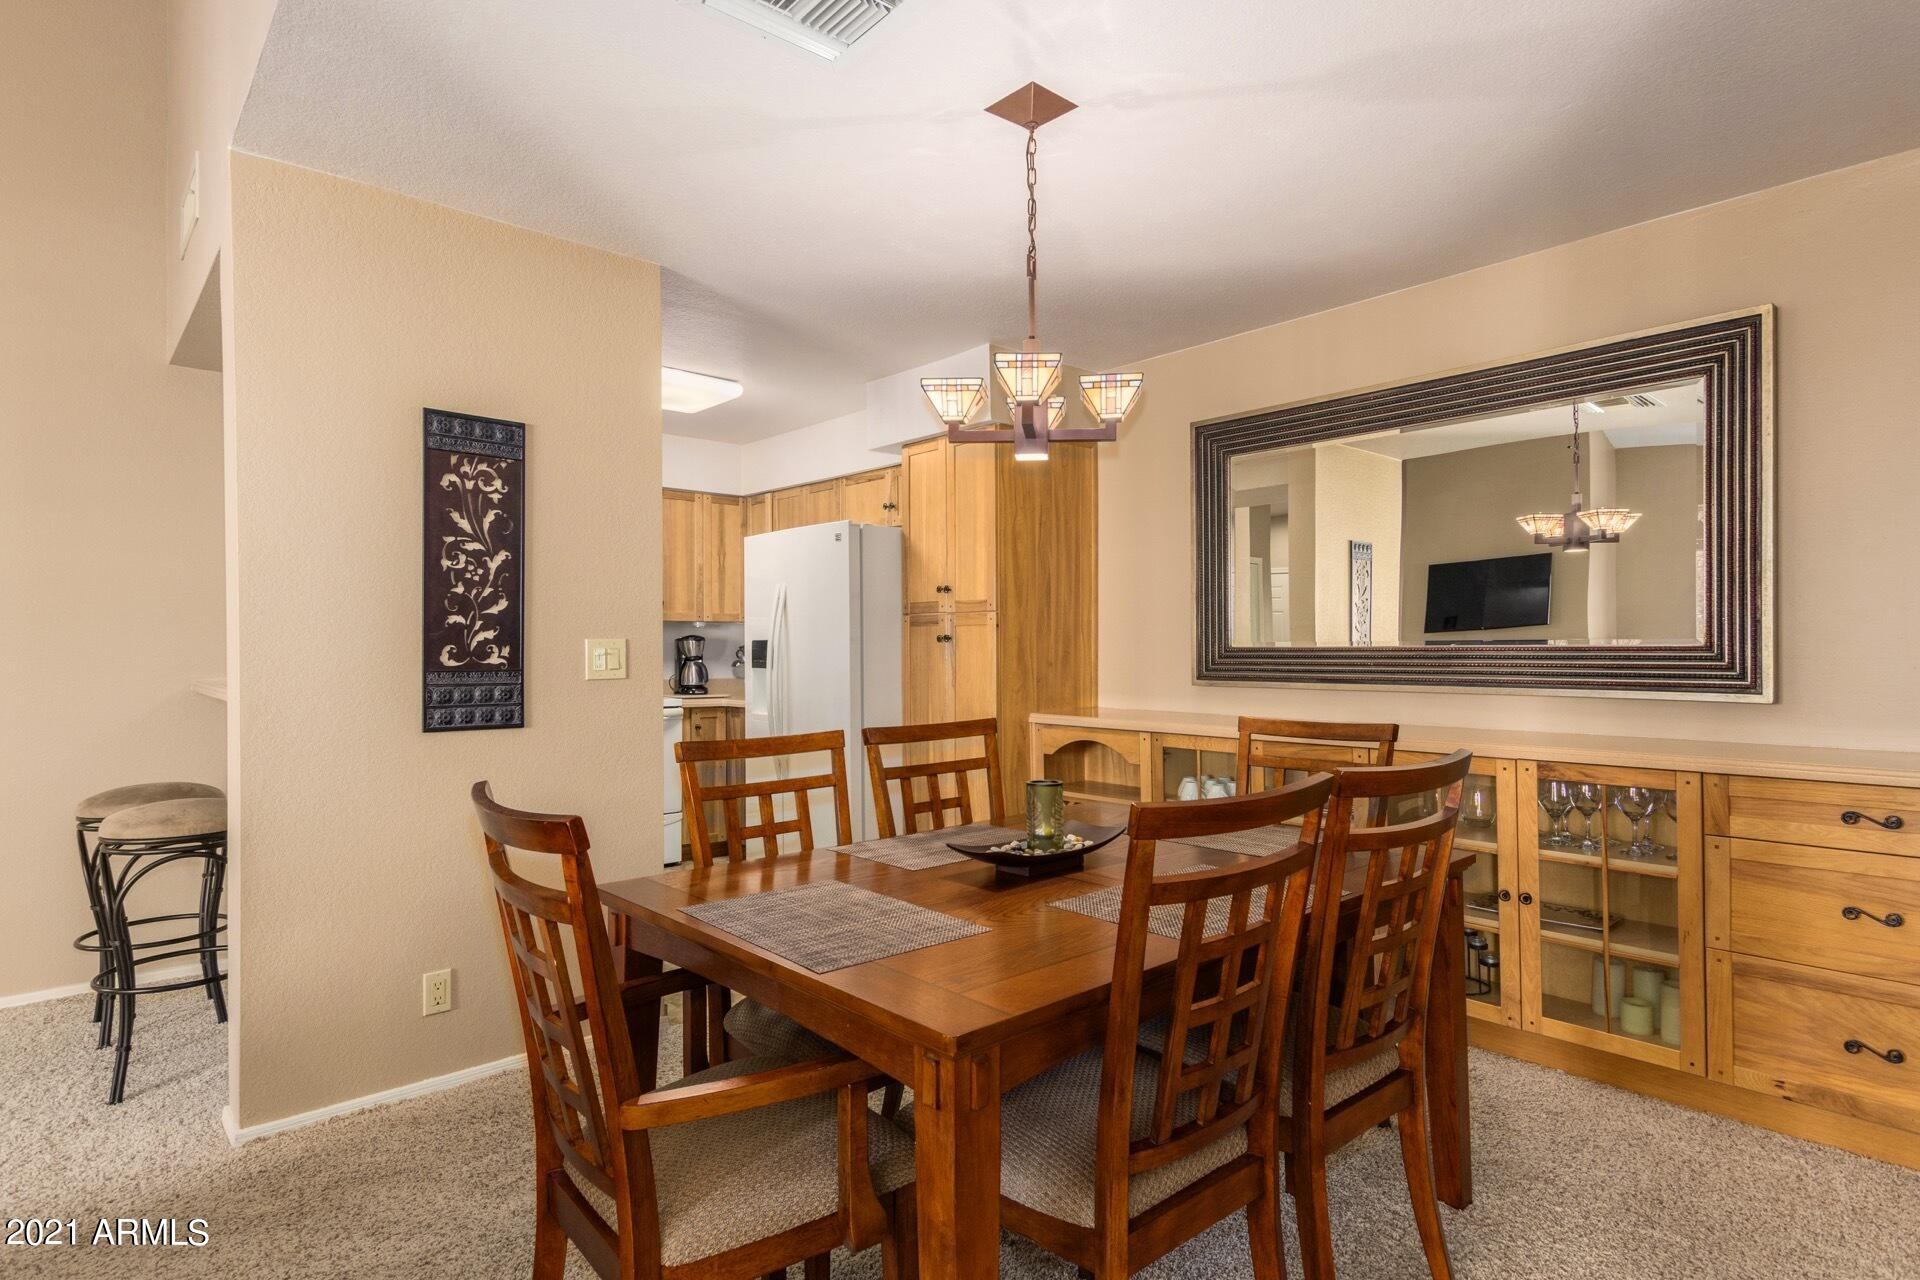 9708 E VIA LINDA Road # 2340, Scottsdale, AZ 85258, 2 Bedrooms Bedrooms, ,Residential Lease,For Rent,9708 E VIA LINDA Road # 2340,6213881